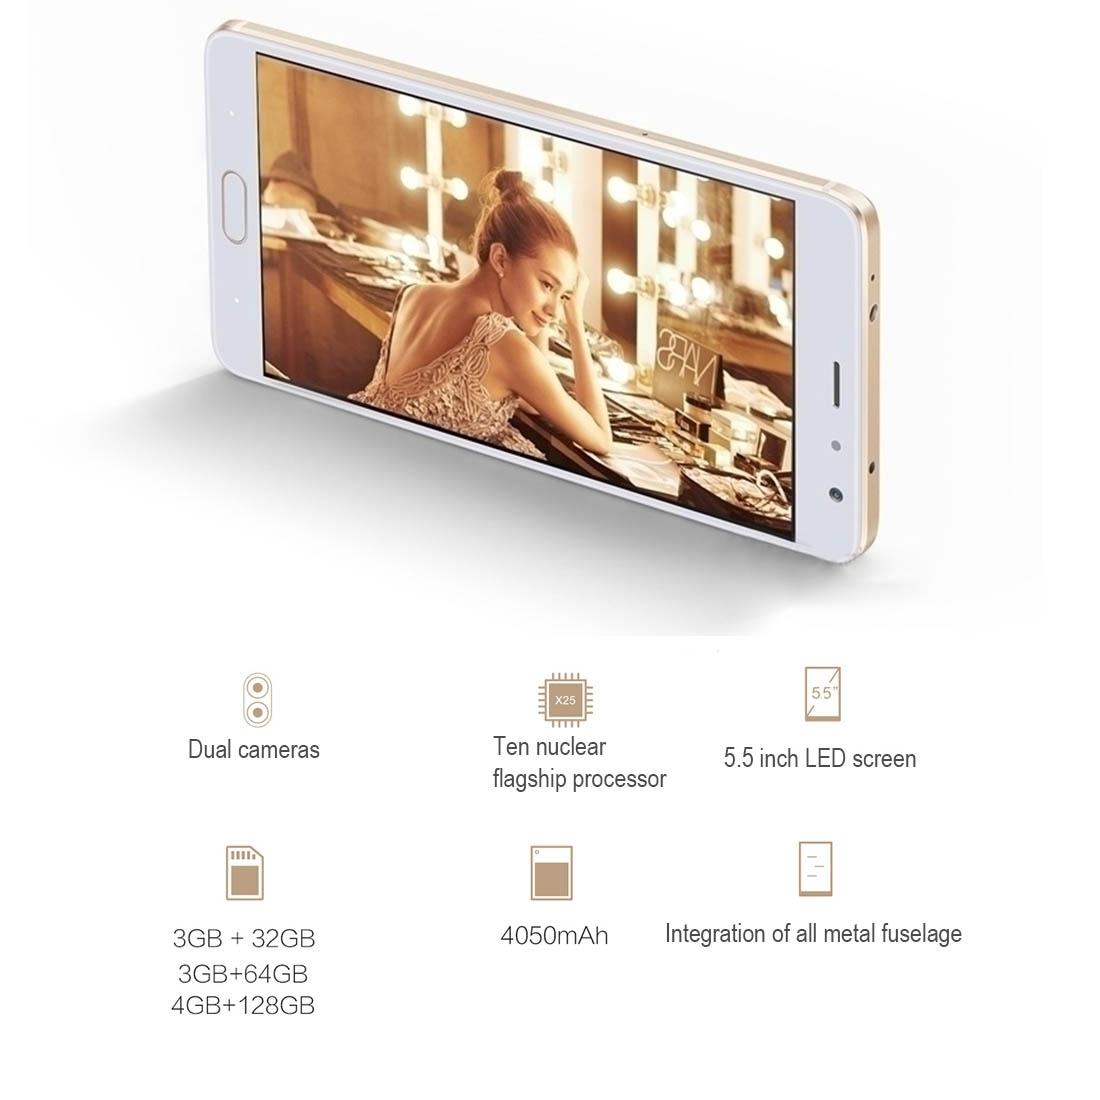 Original Xiaomi Redmi Pro 5.5 inch MTK Helio X20 Deca Core 2.1GHz Android 6.0 RAM 3GB ROM 32GB 4G LTE Phone Call Tablet PC